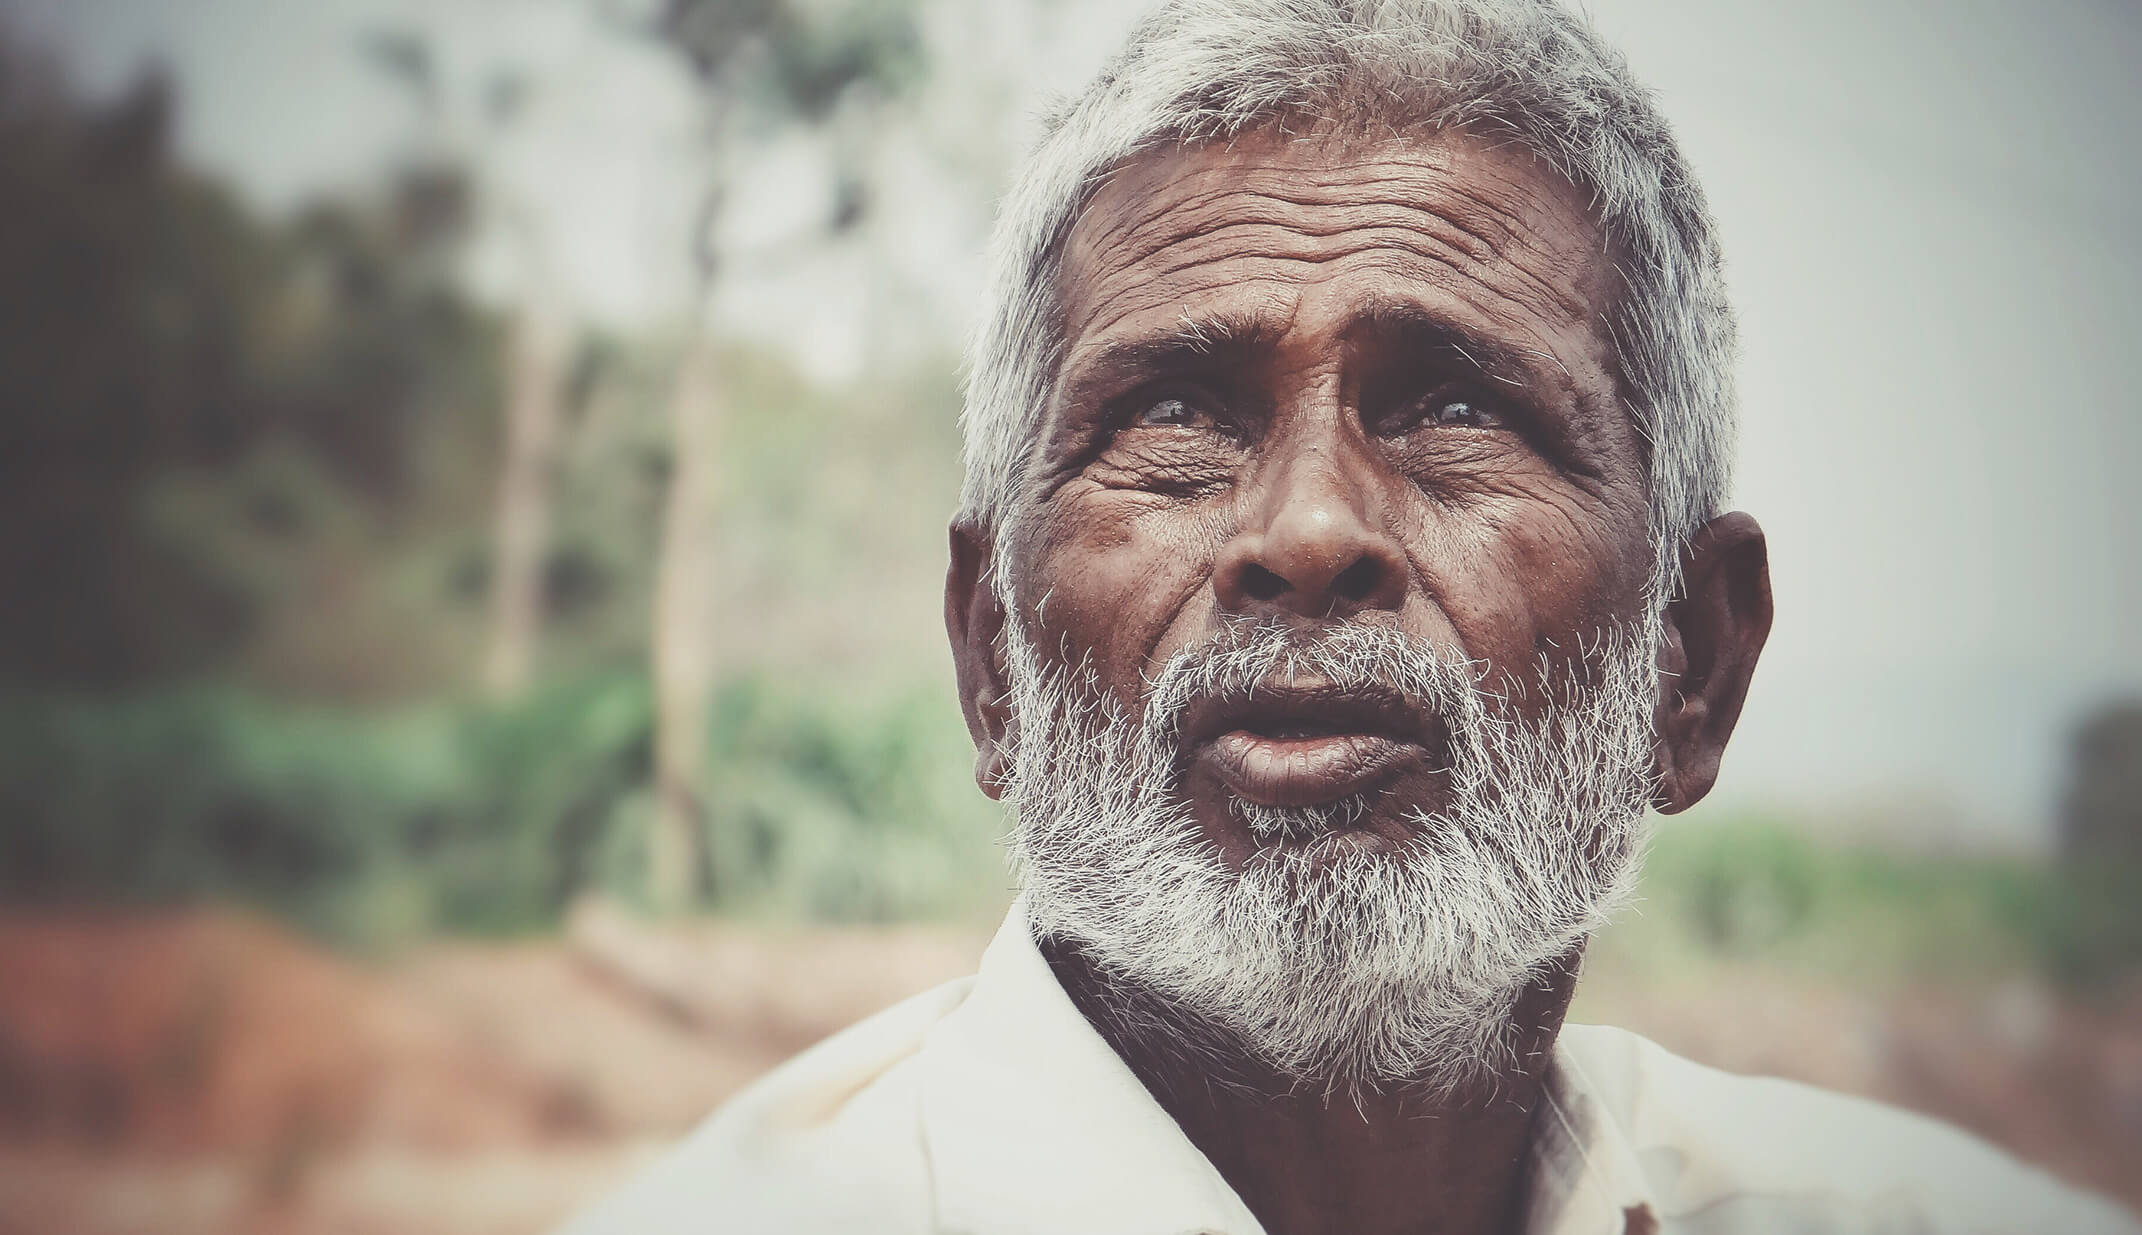 man hindu indian portrait looking background portrait landscape documentary feelings emotions sad sadness girl portrait smile asia content travel real UGC photography